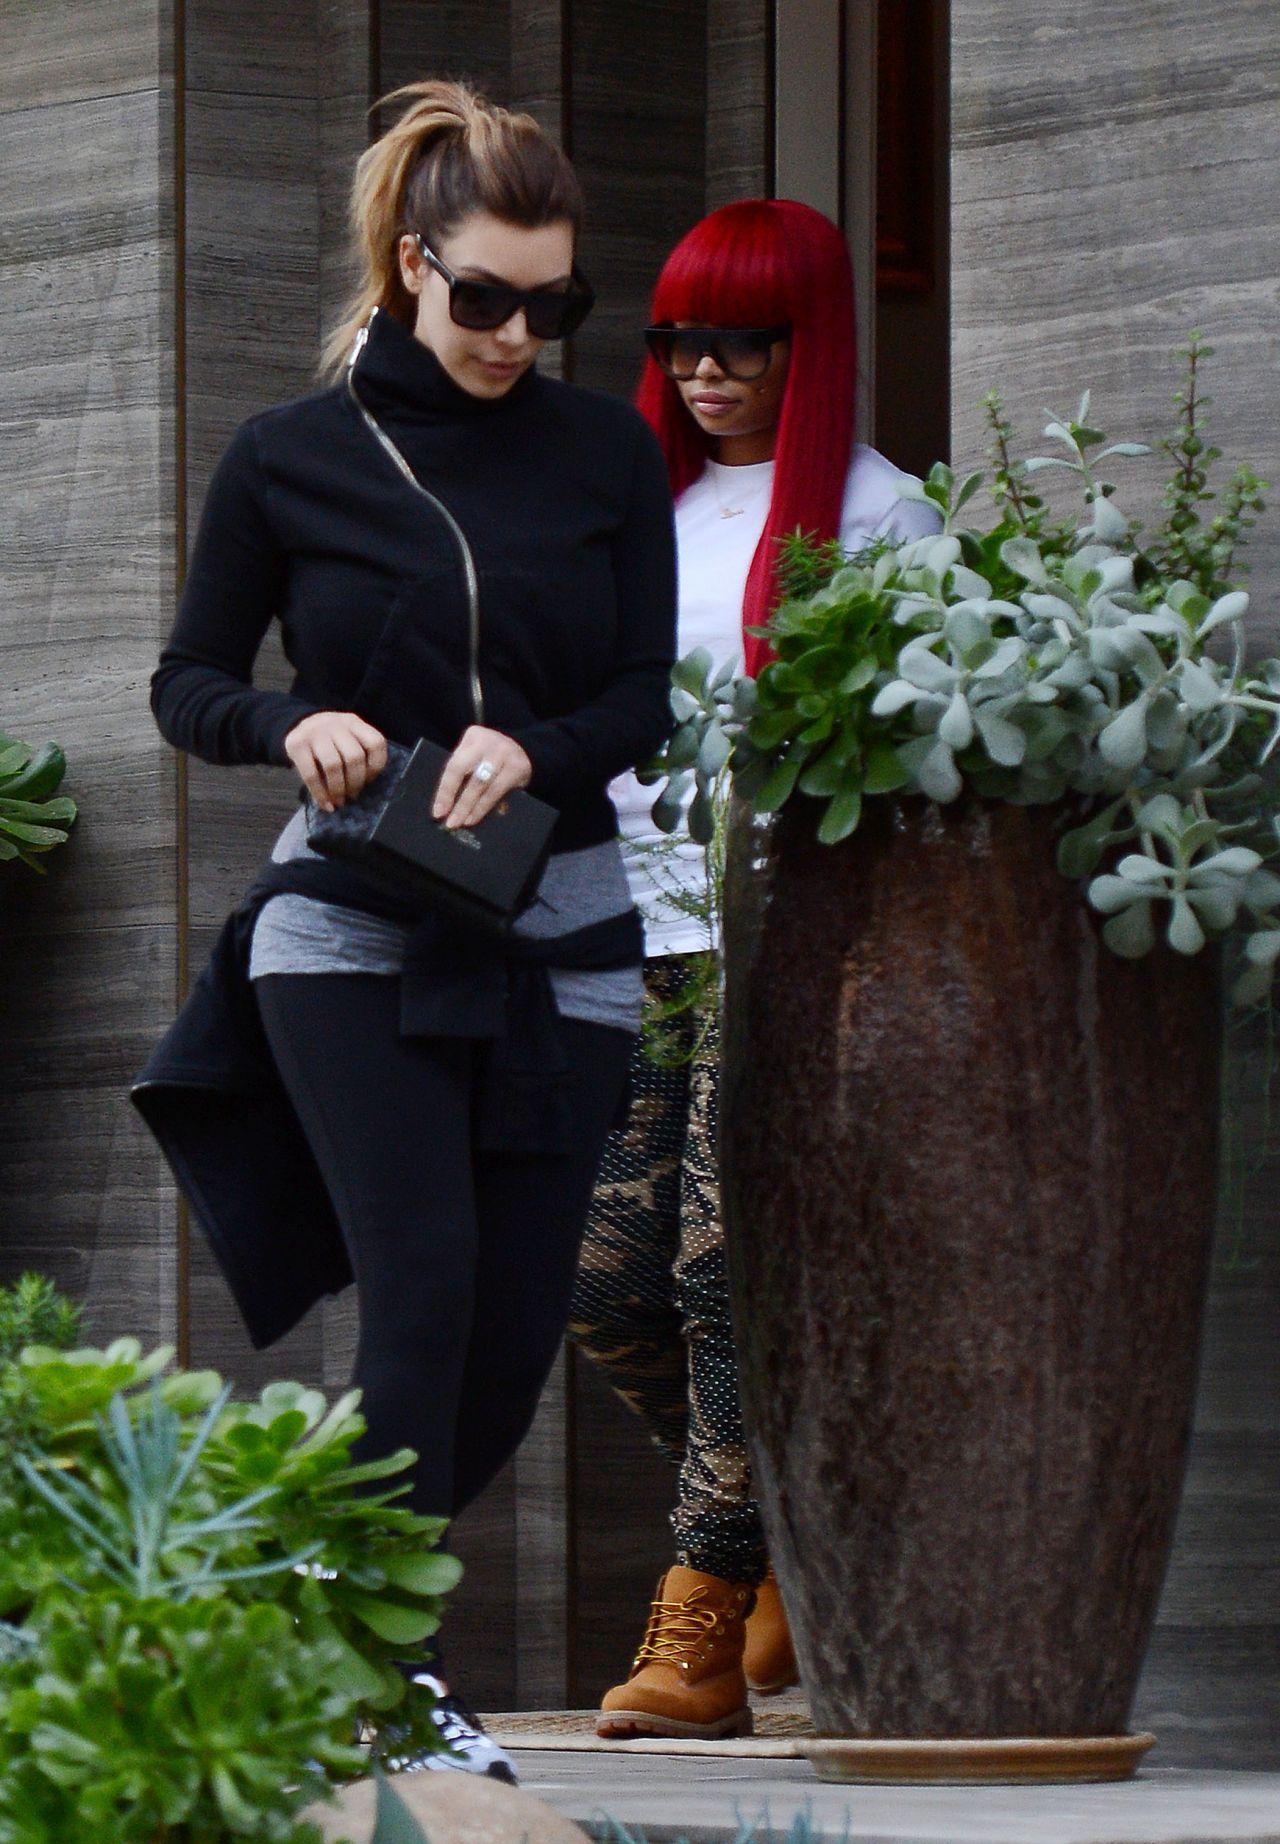 Kim Kardashian Street Style - Visits a Friend in Beverly Hills - December 2013